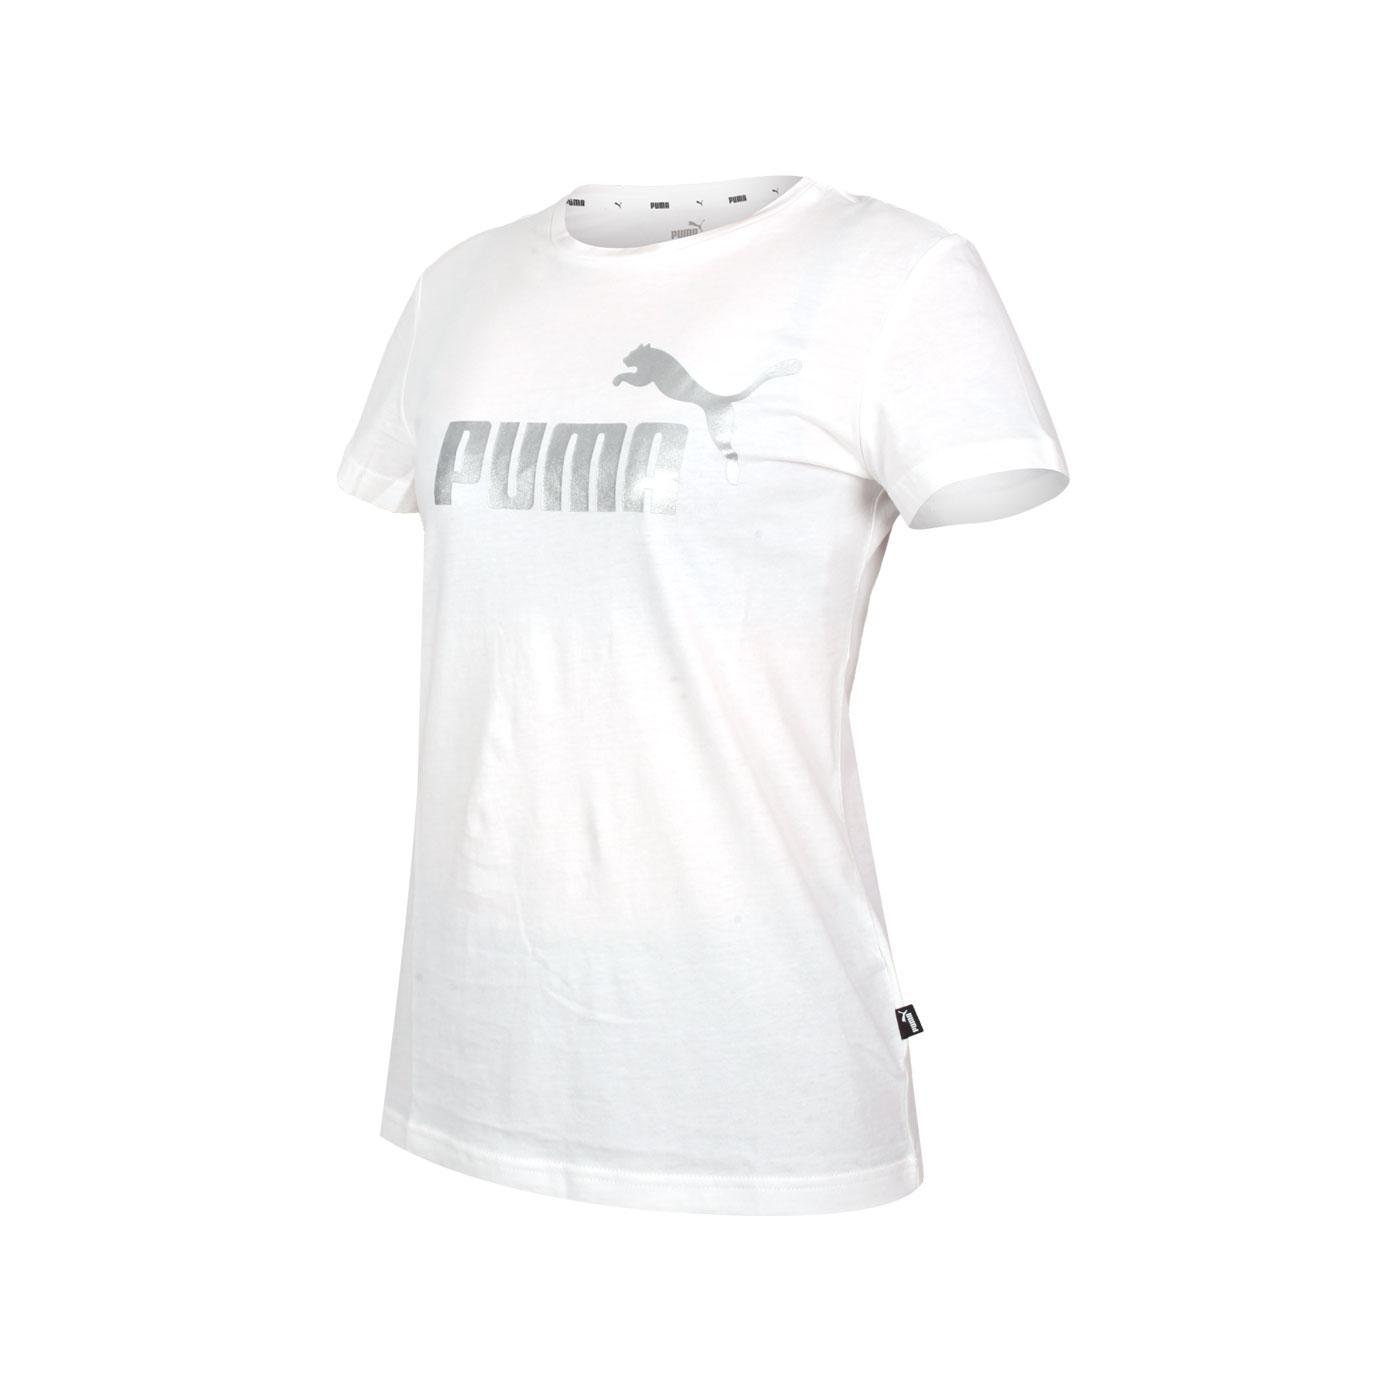 PUMA 女款基本系列短袖T恤 58689002 - 白銀